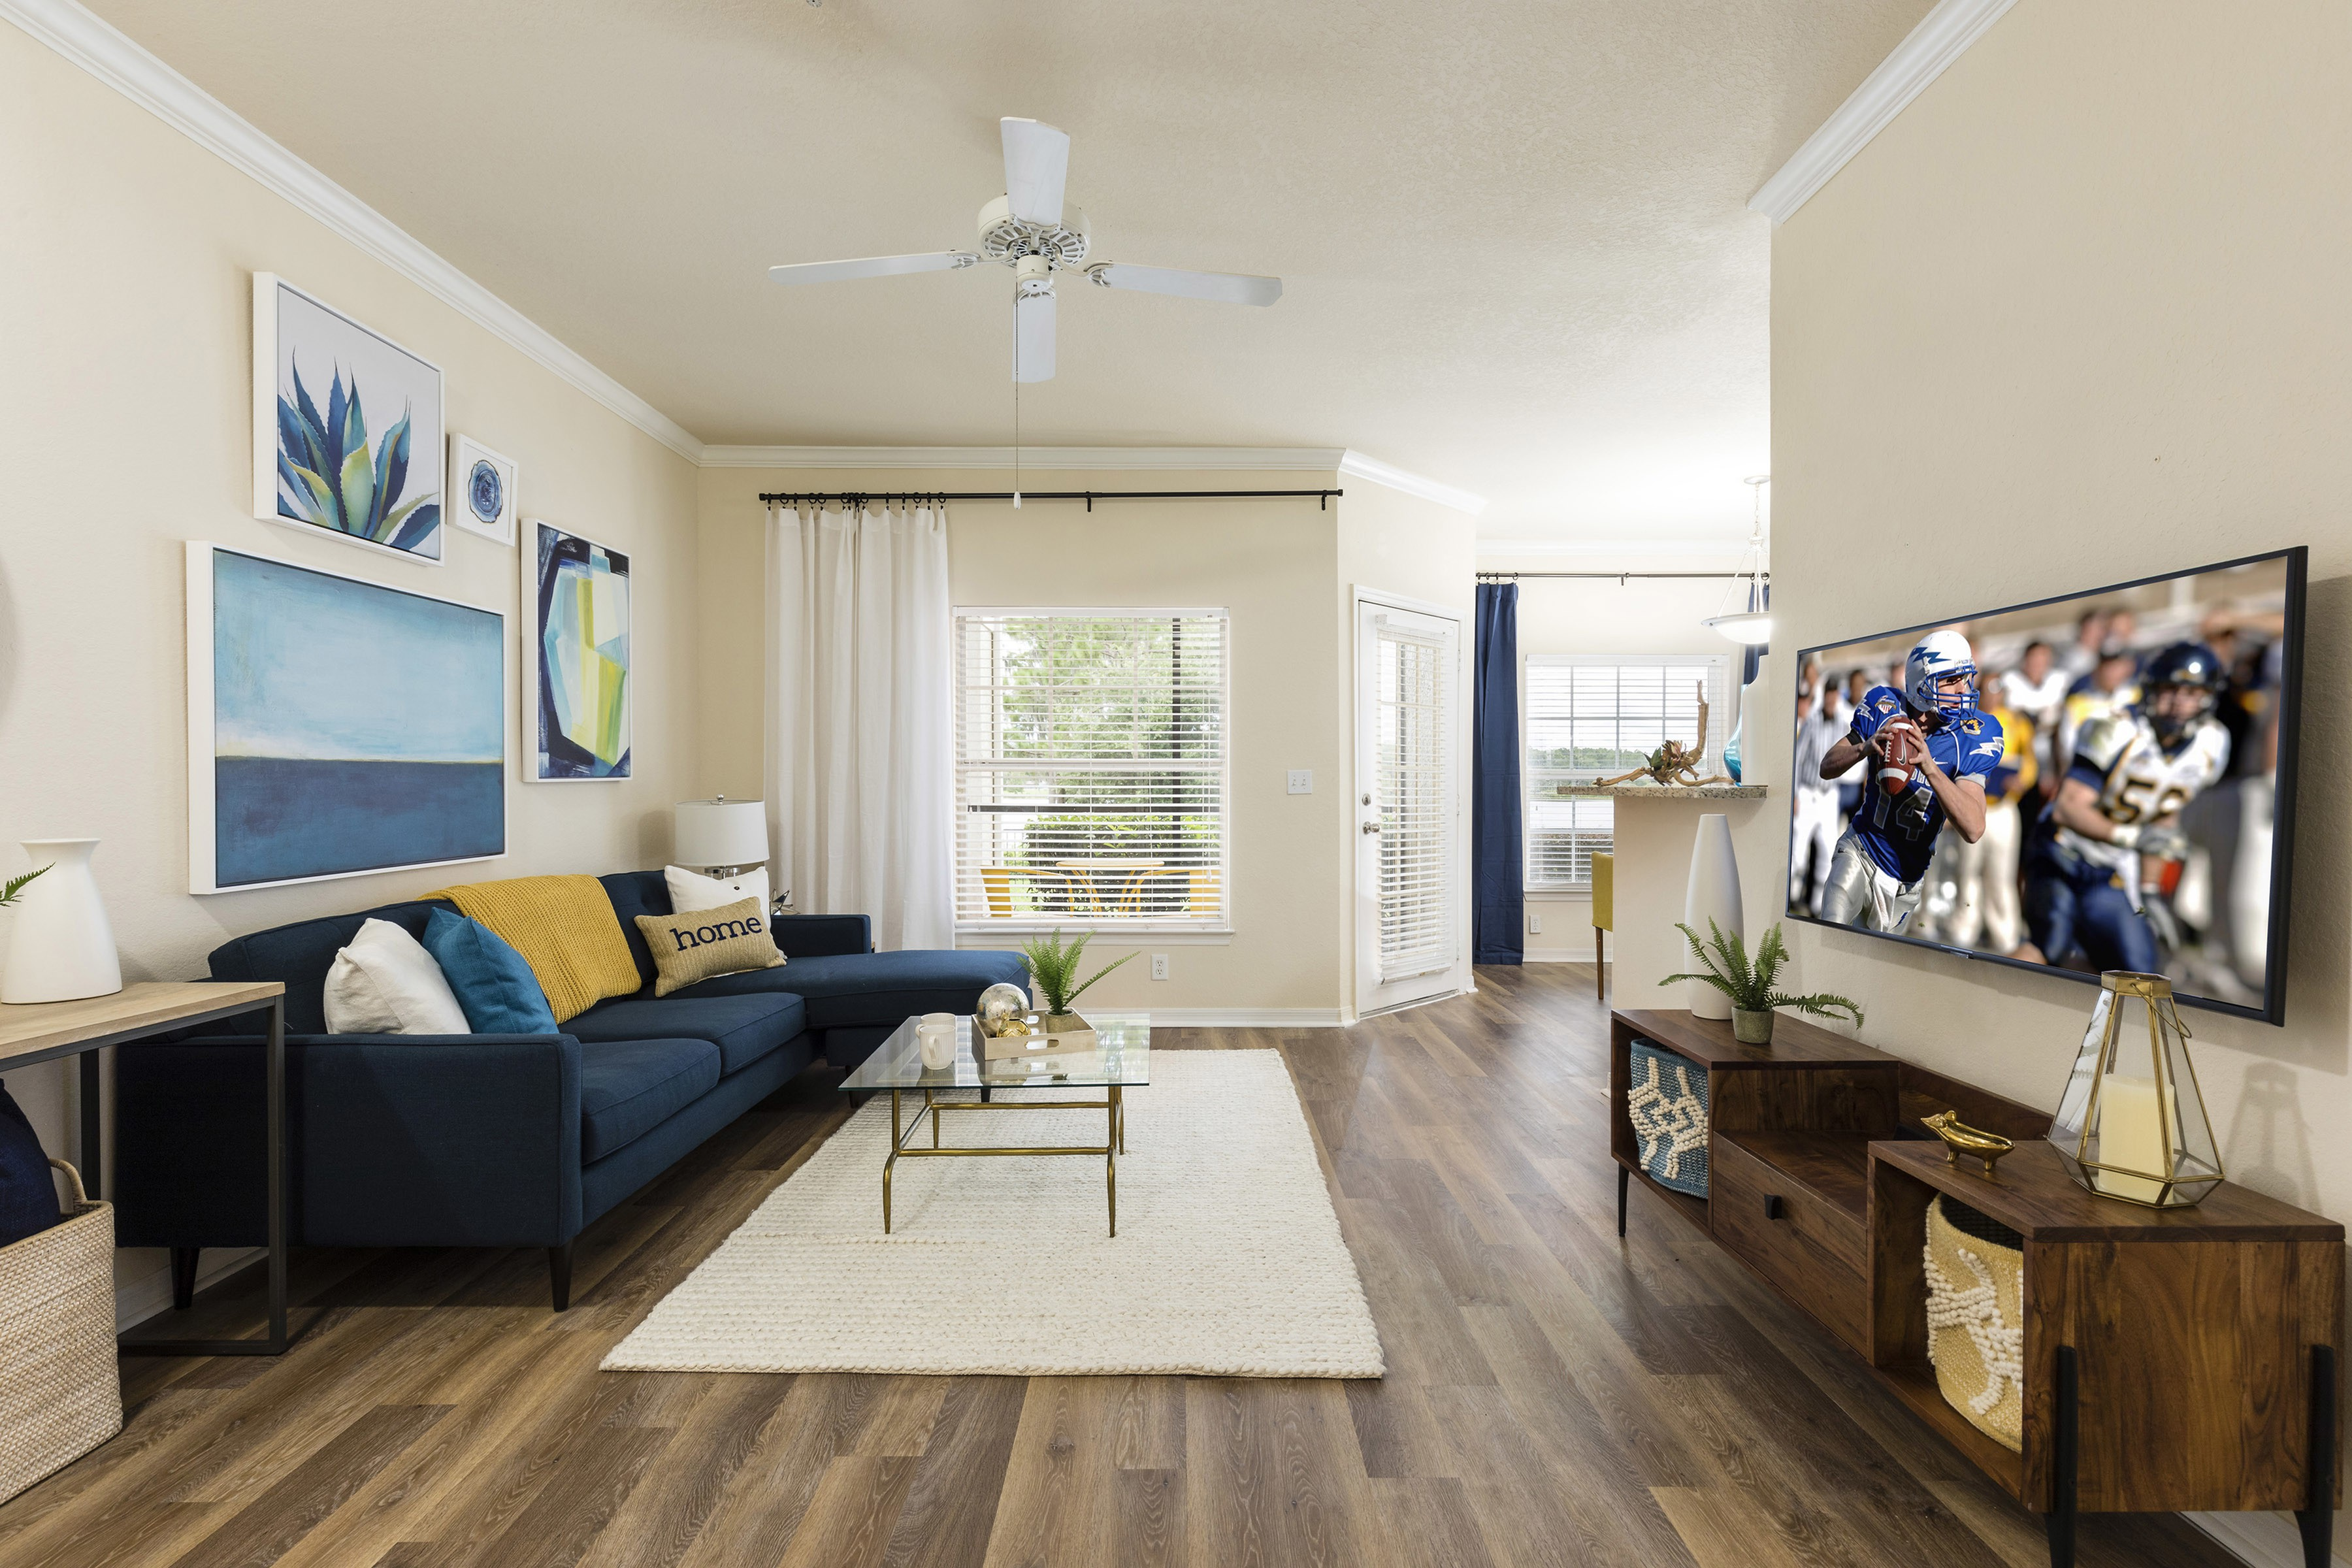 Apartments Near Westside Tech Harbortown Luxury Apartments for Westside Tech Students in Winter Garden, FL